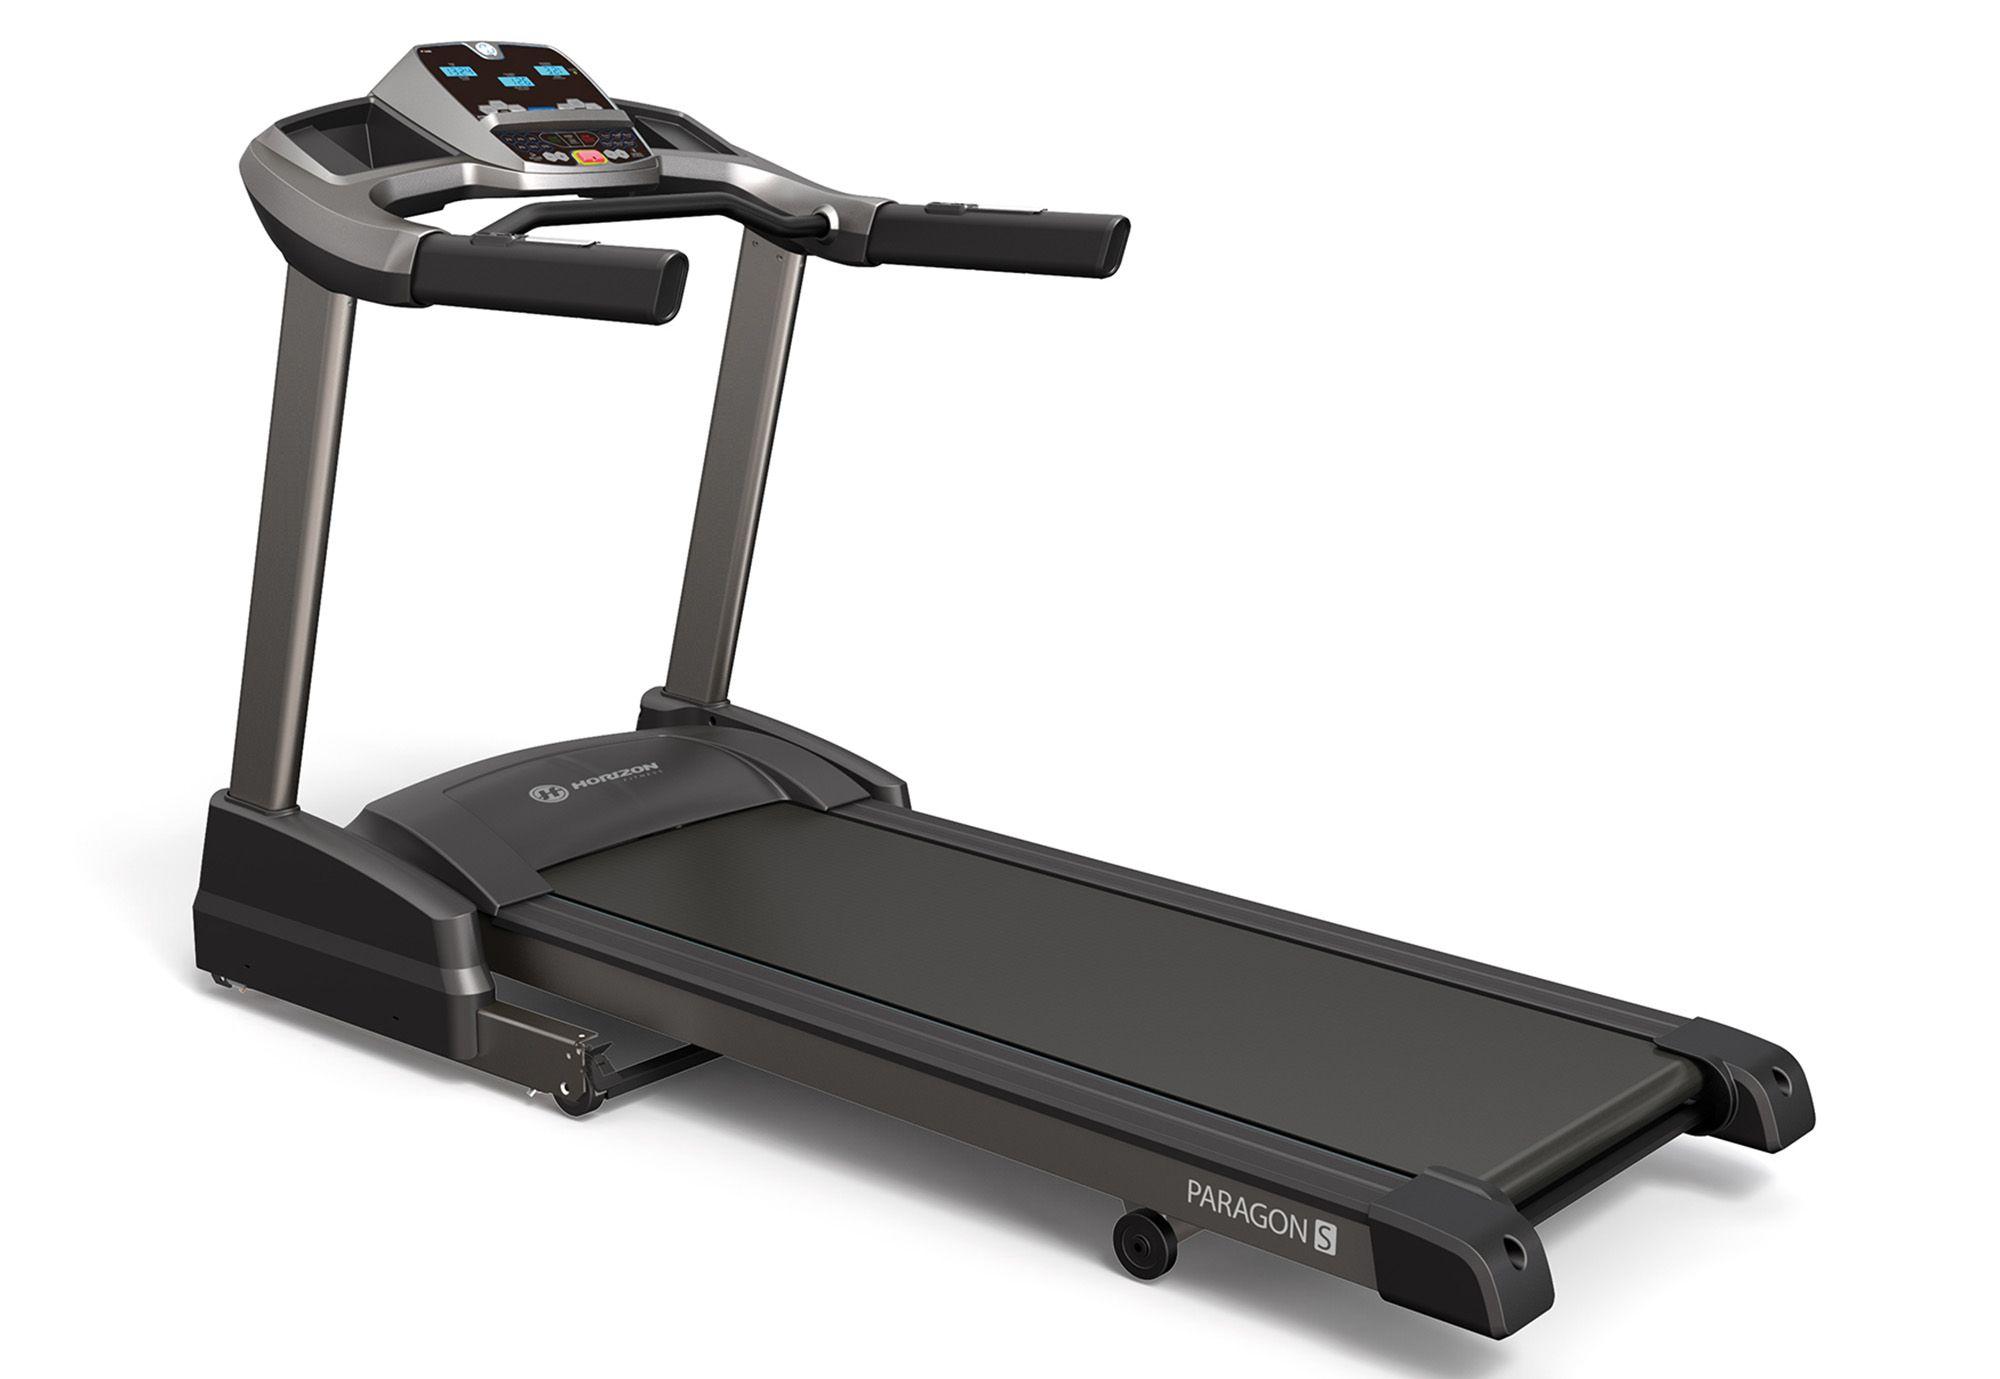 HORIZON FITNESS Laufband, »Paragon 5S«, Horizon Fitness